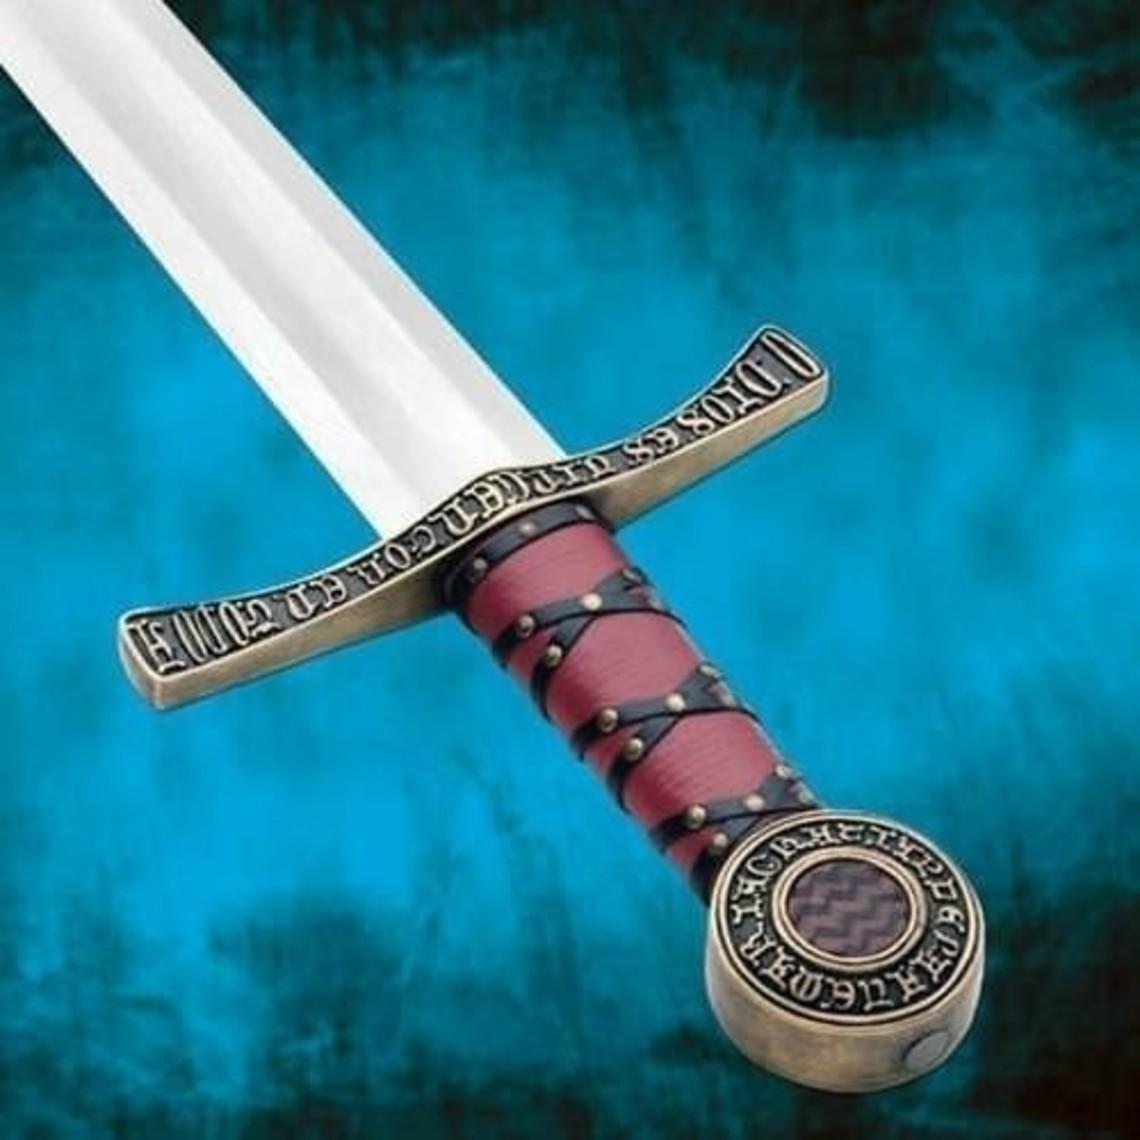 Windlass Steelcrafts Mittelalterliche Klinge Madrid Oakeshotts XII